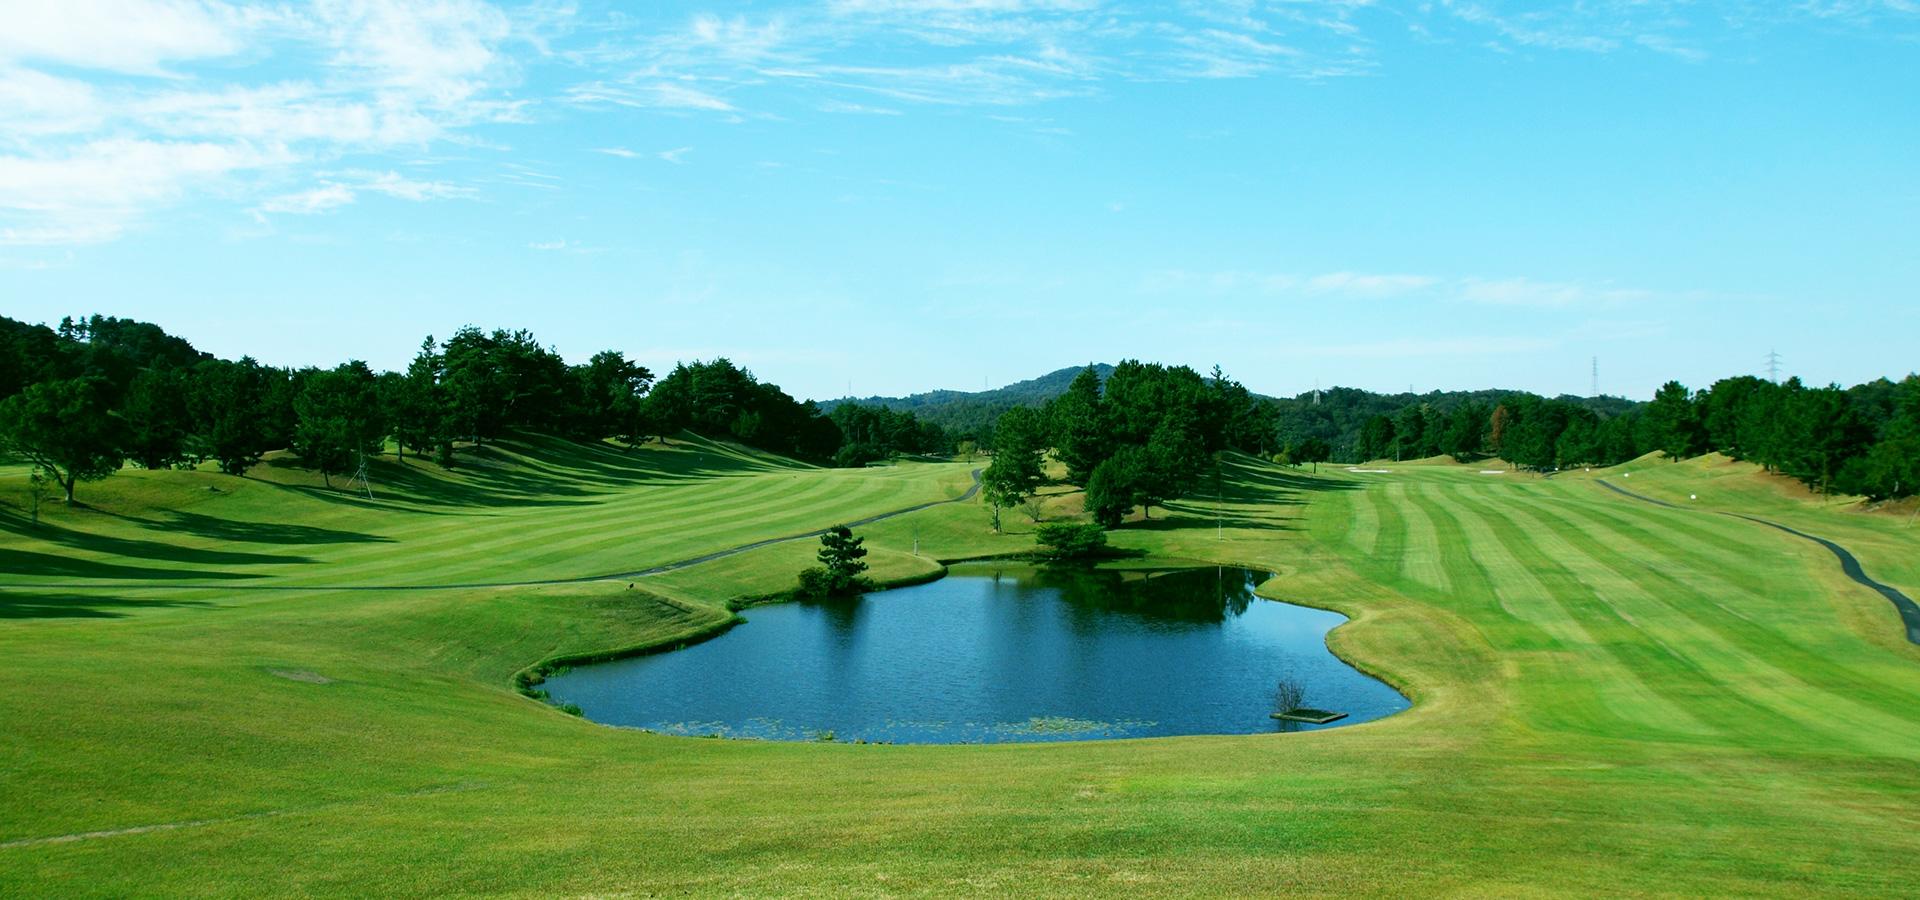 Ryuo Golf Course